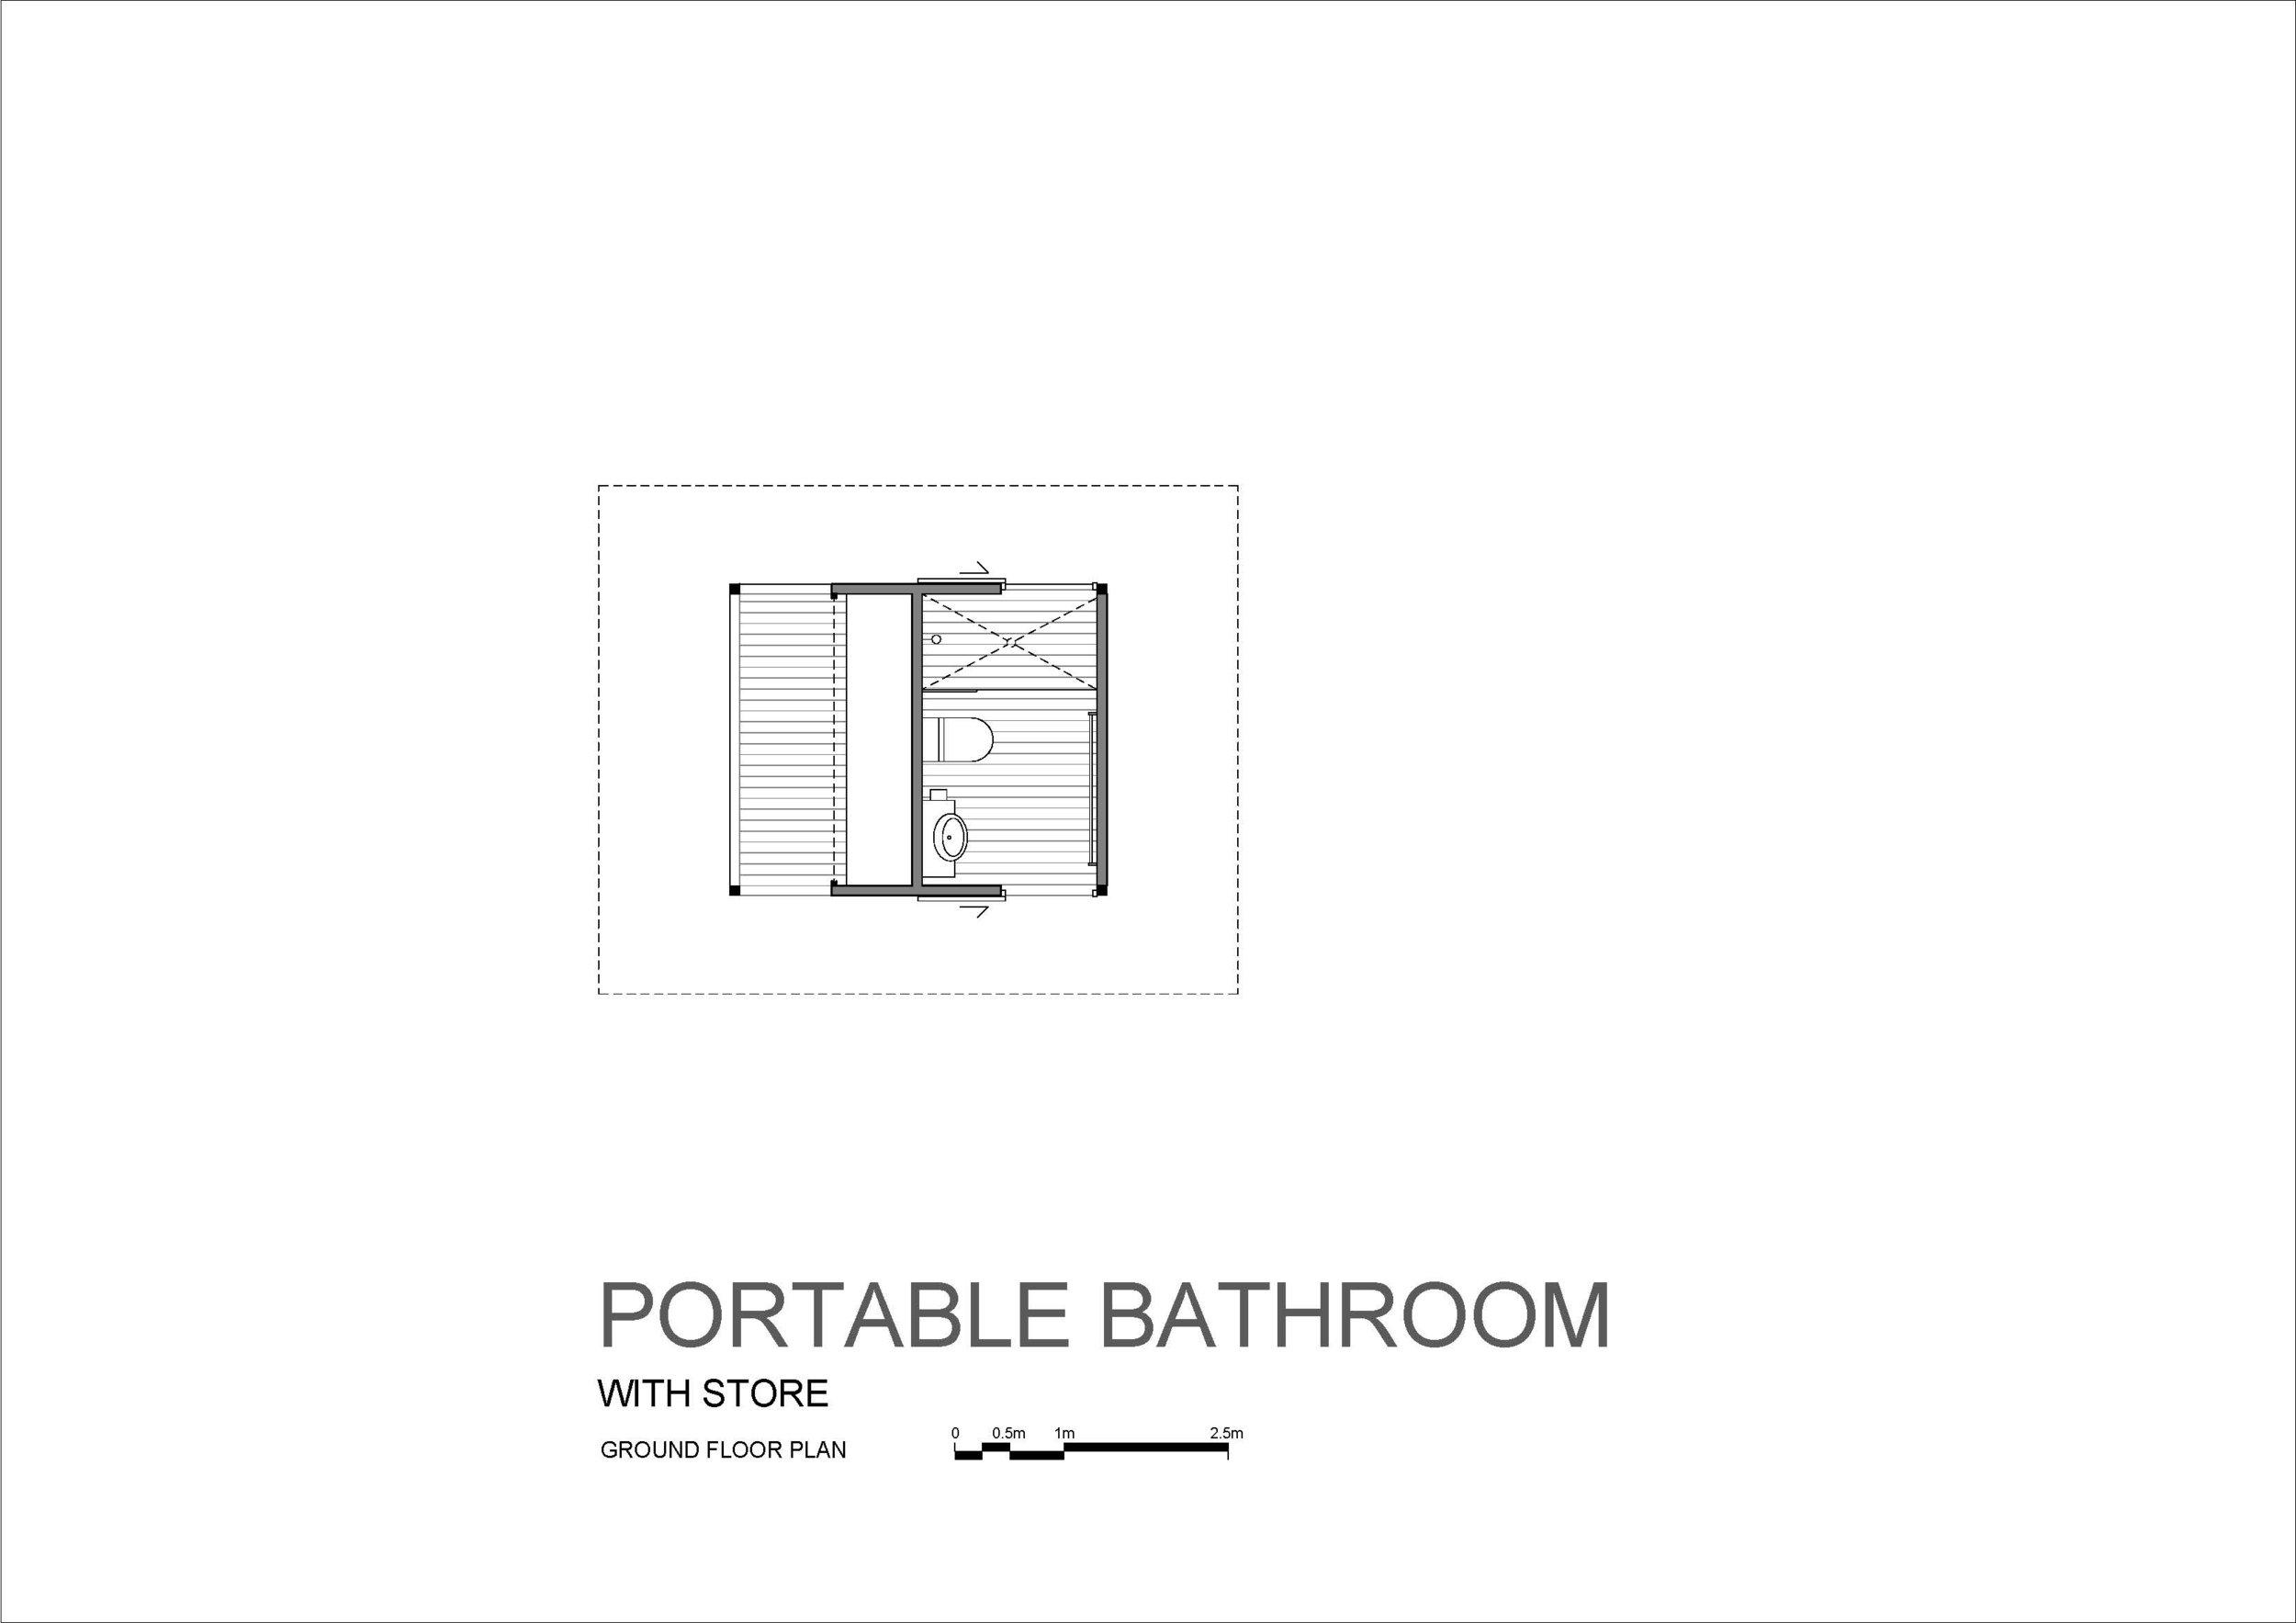 PORTABLE BATHROOM_Page_1.jpg